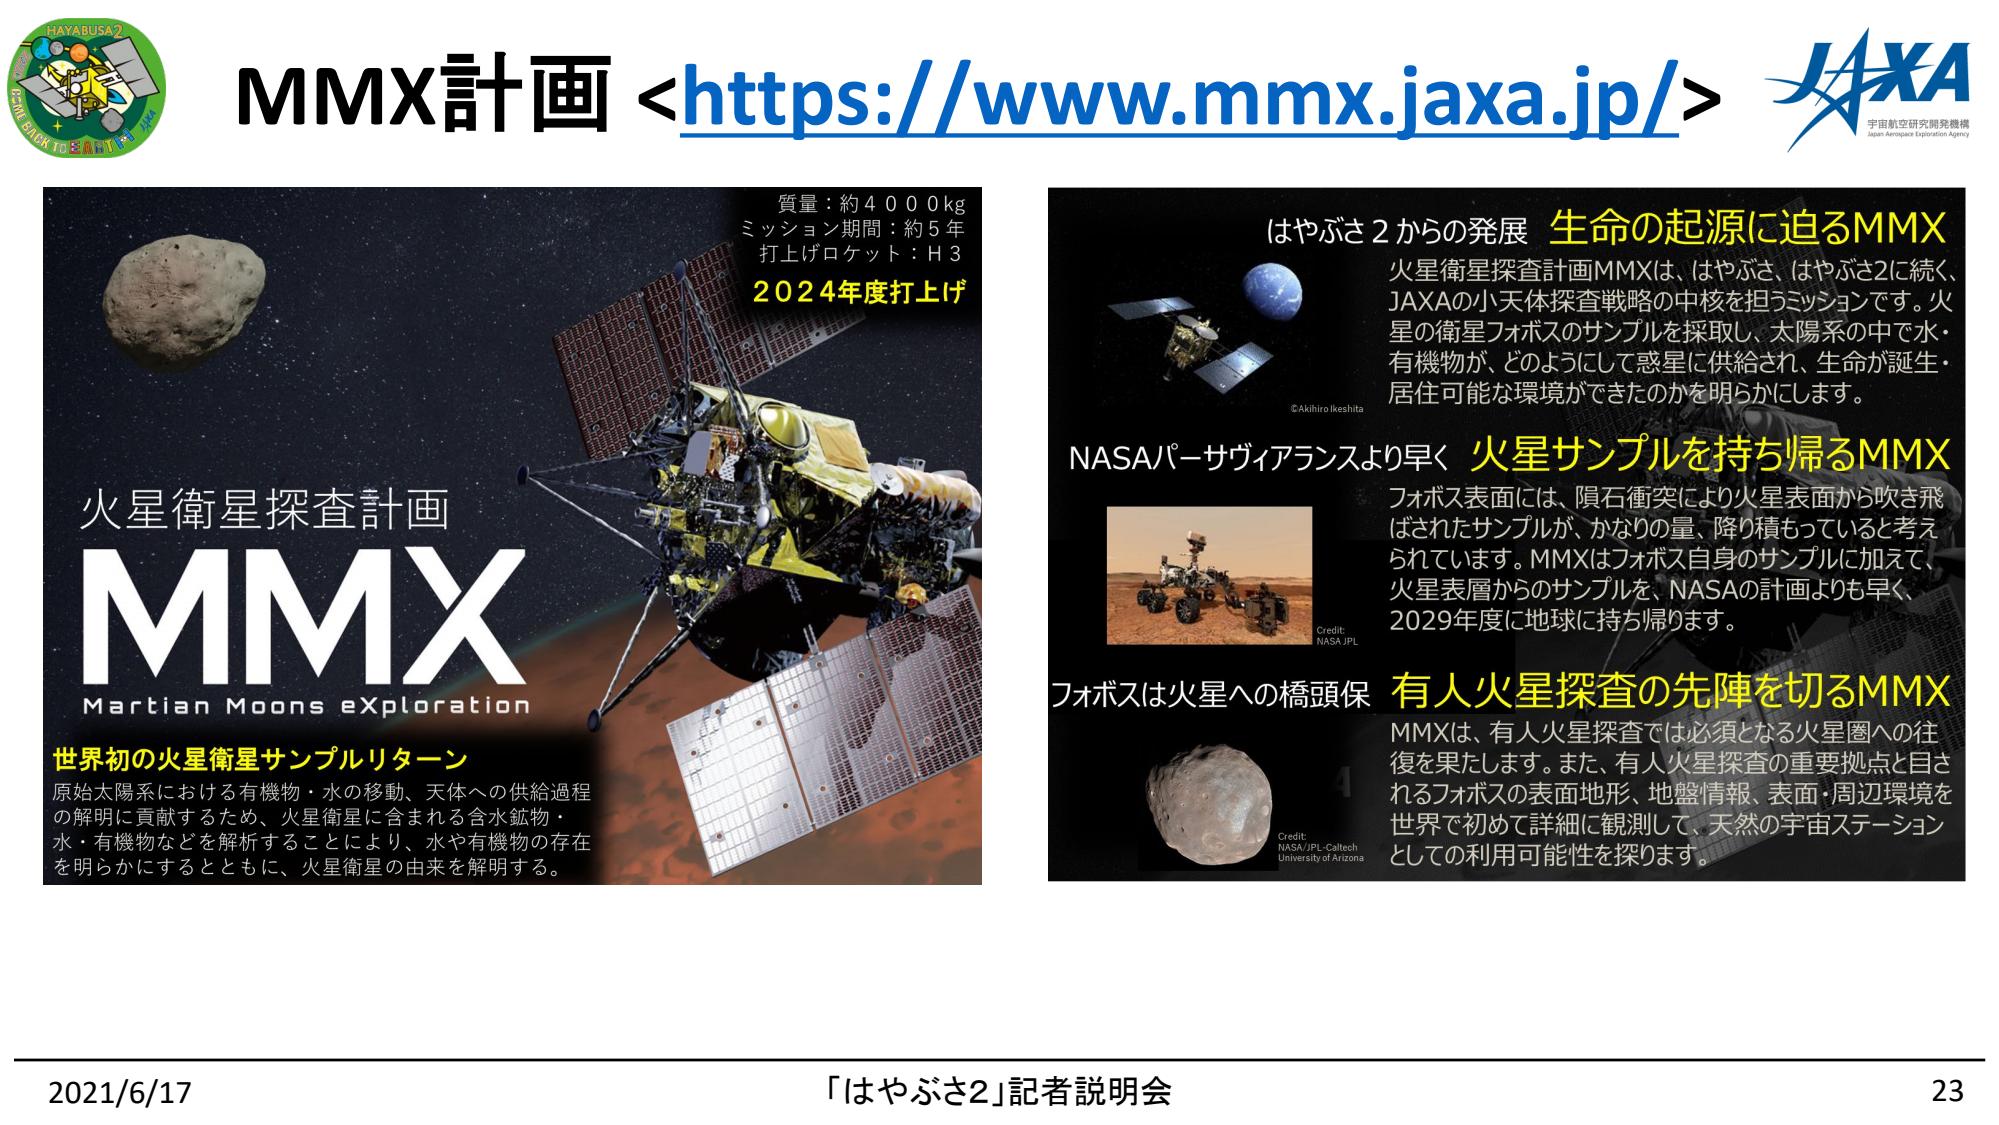 f:id:Imamura:20210617130346p:plain